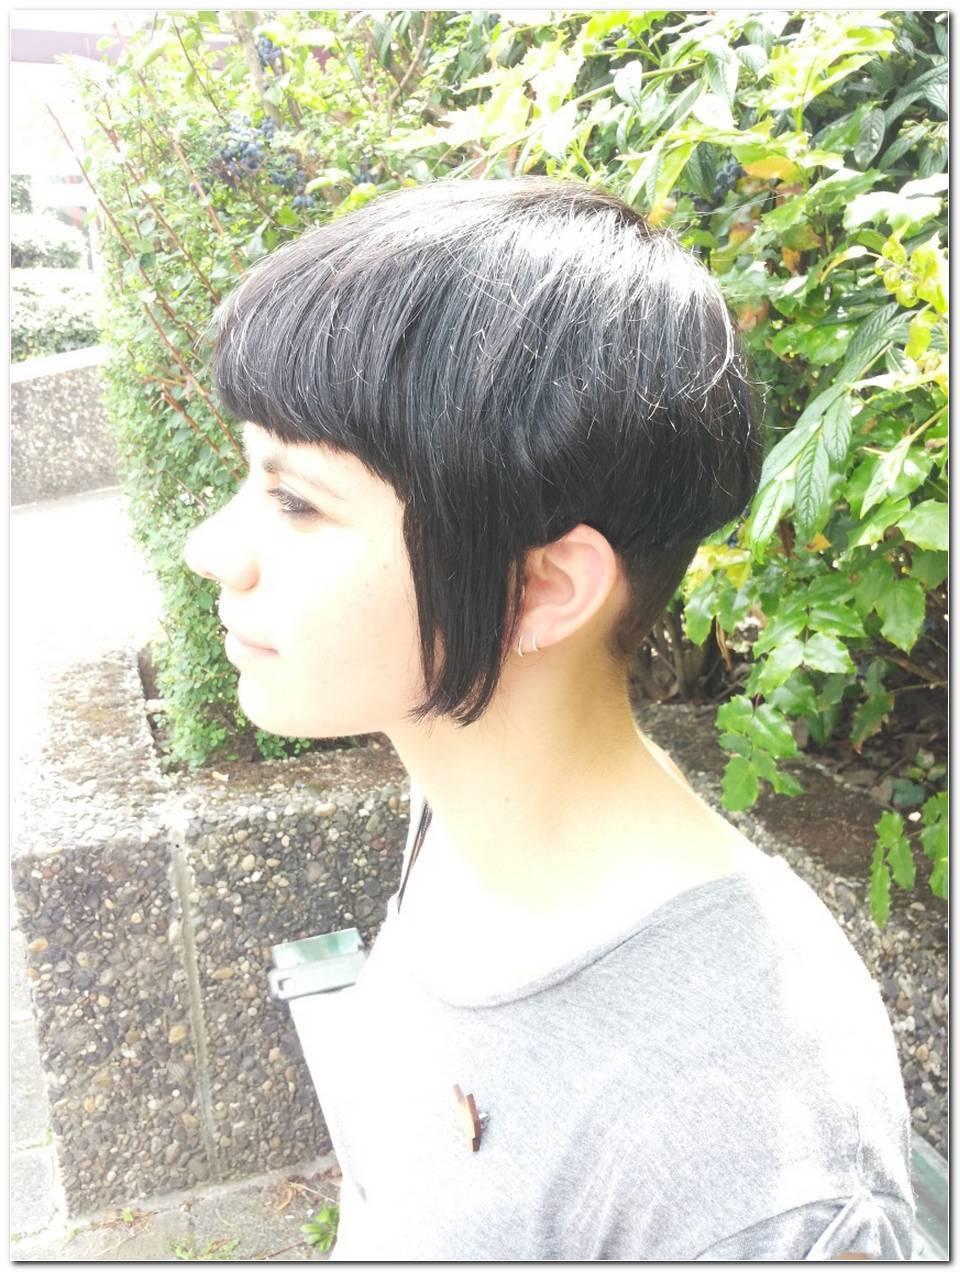 Skinhead Frisur Frau